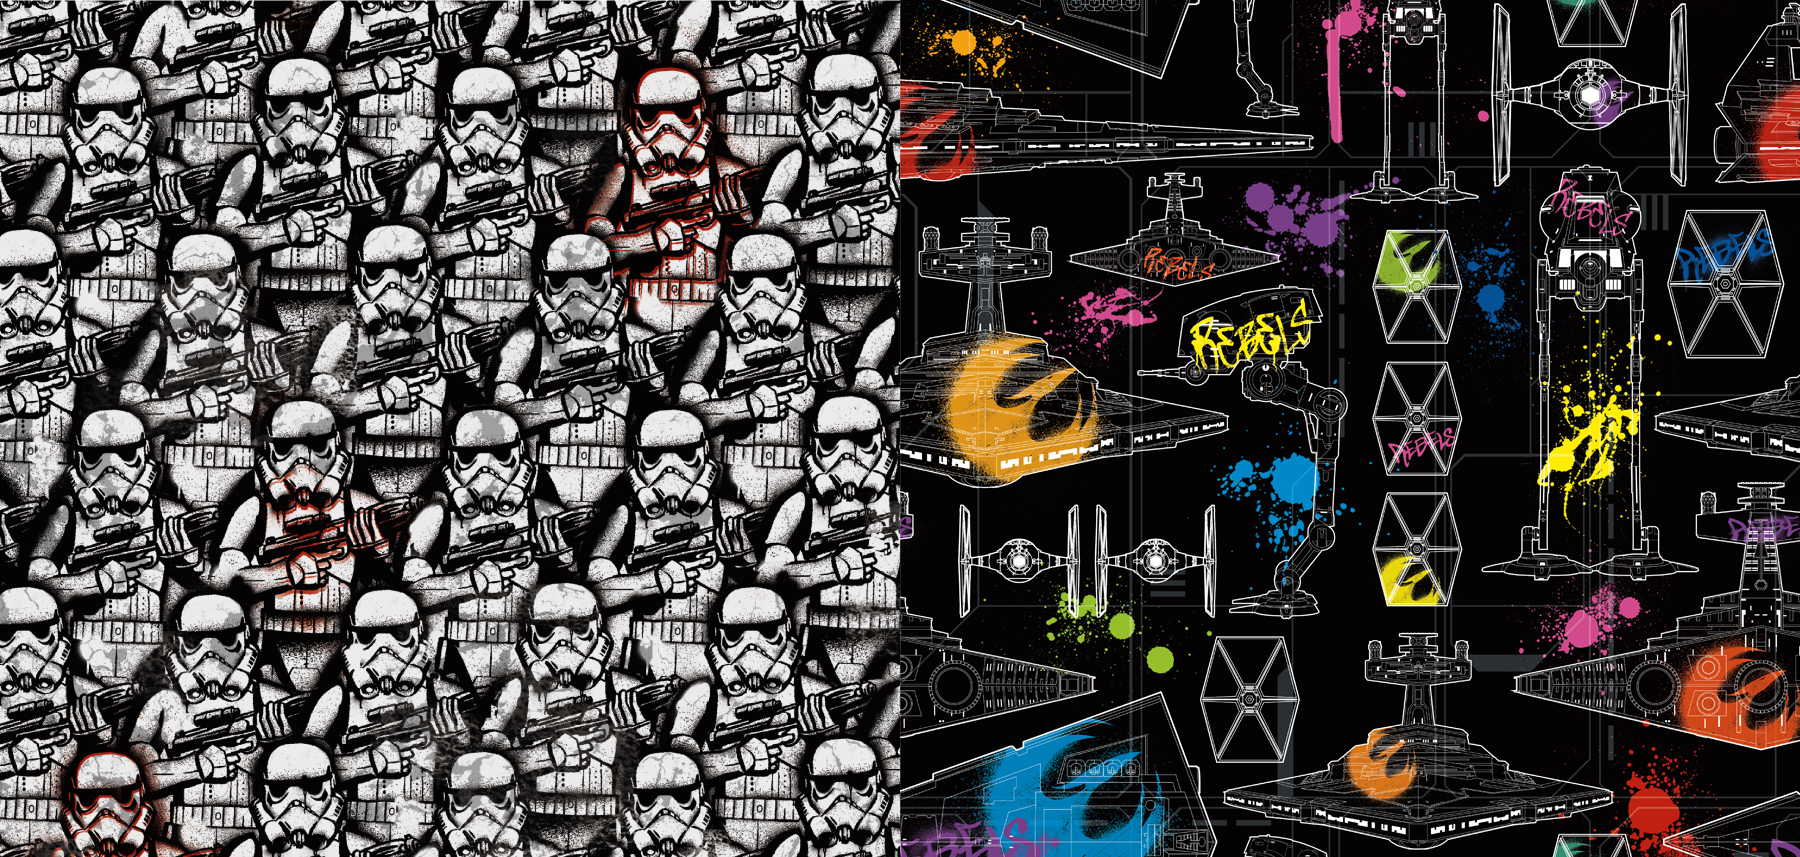 Star Wars: Rebels Style Guide Design - Guide 4